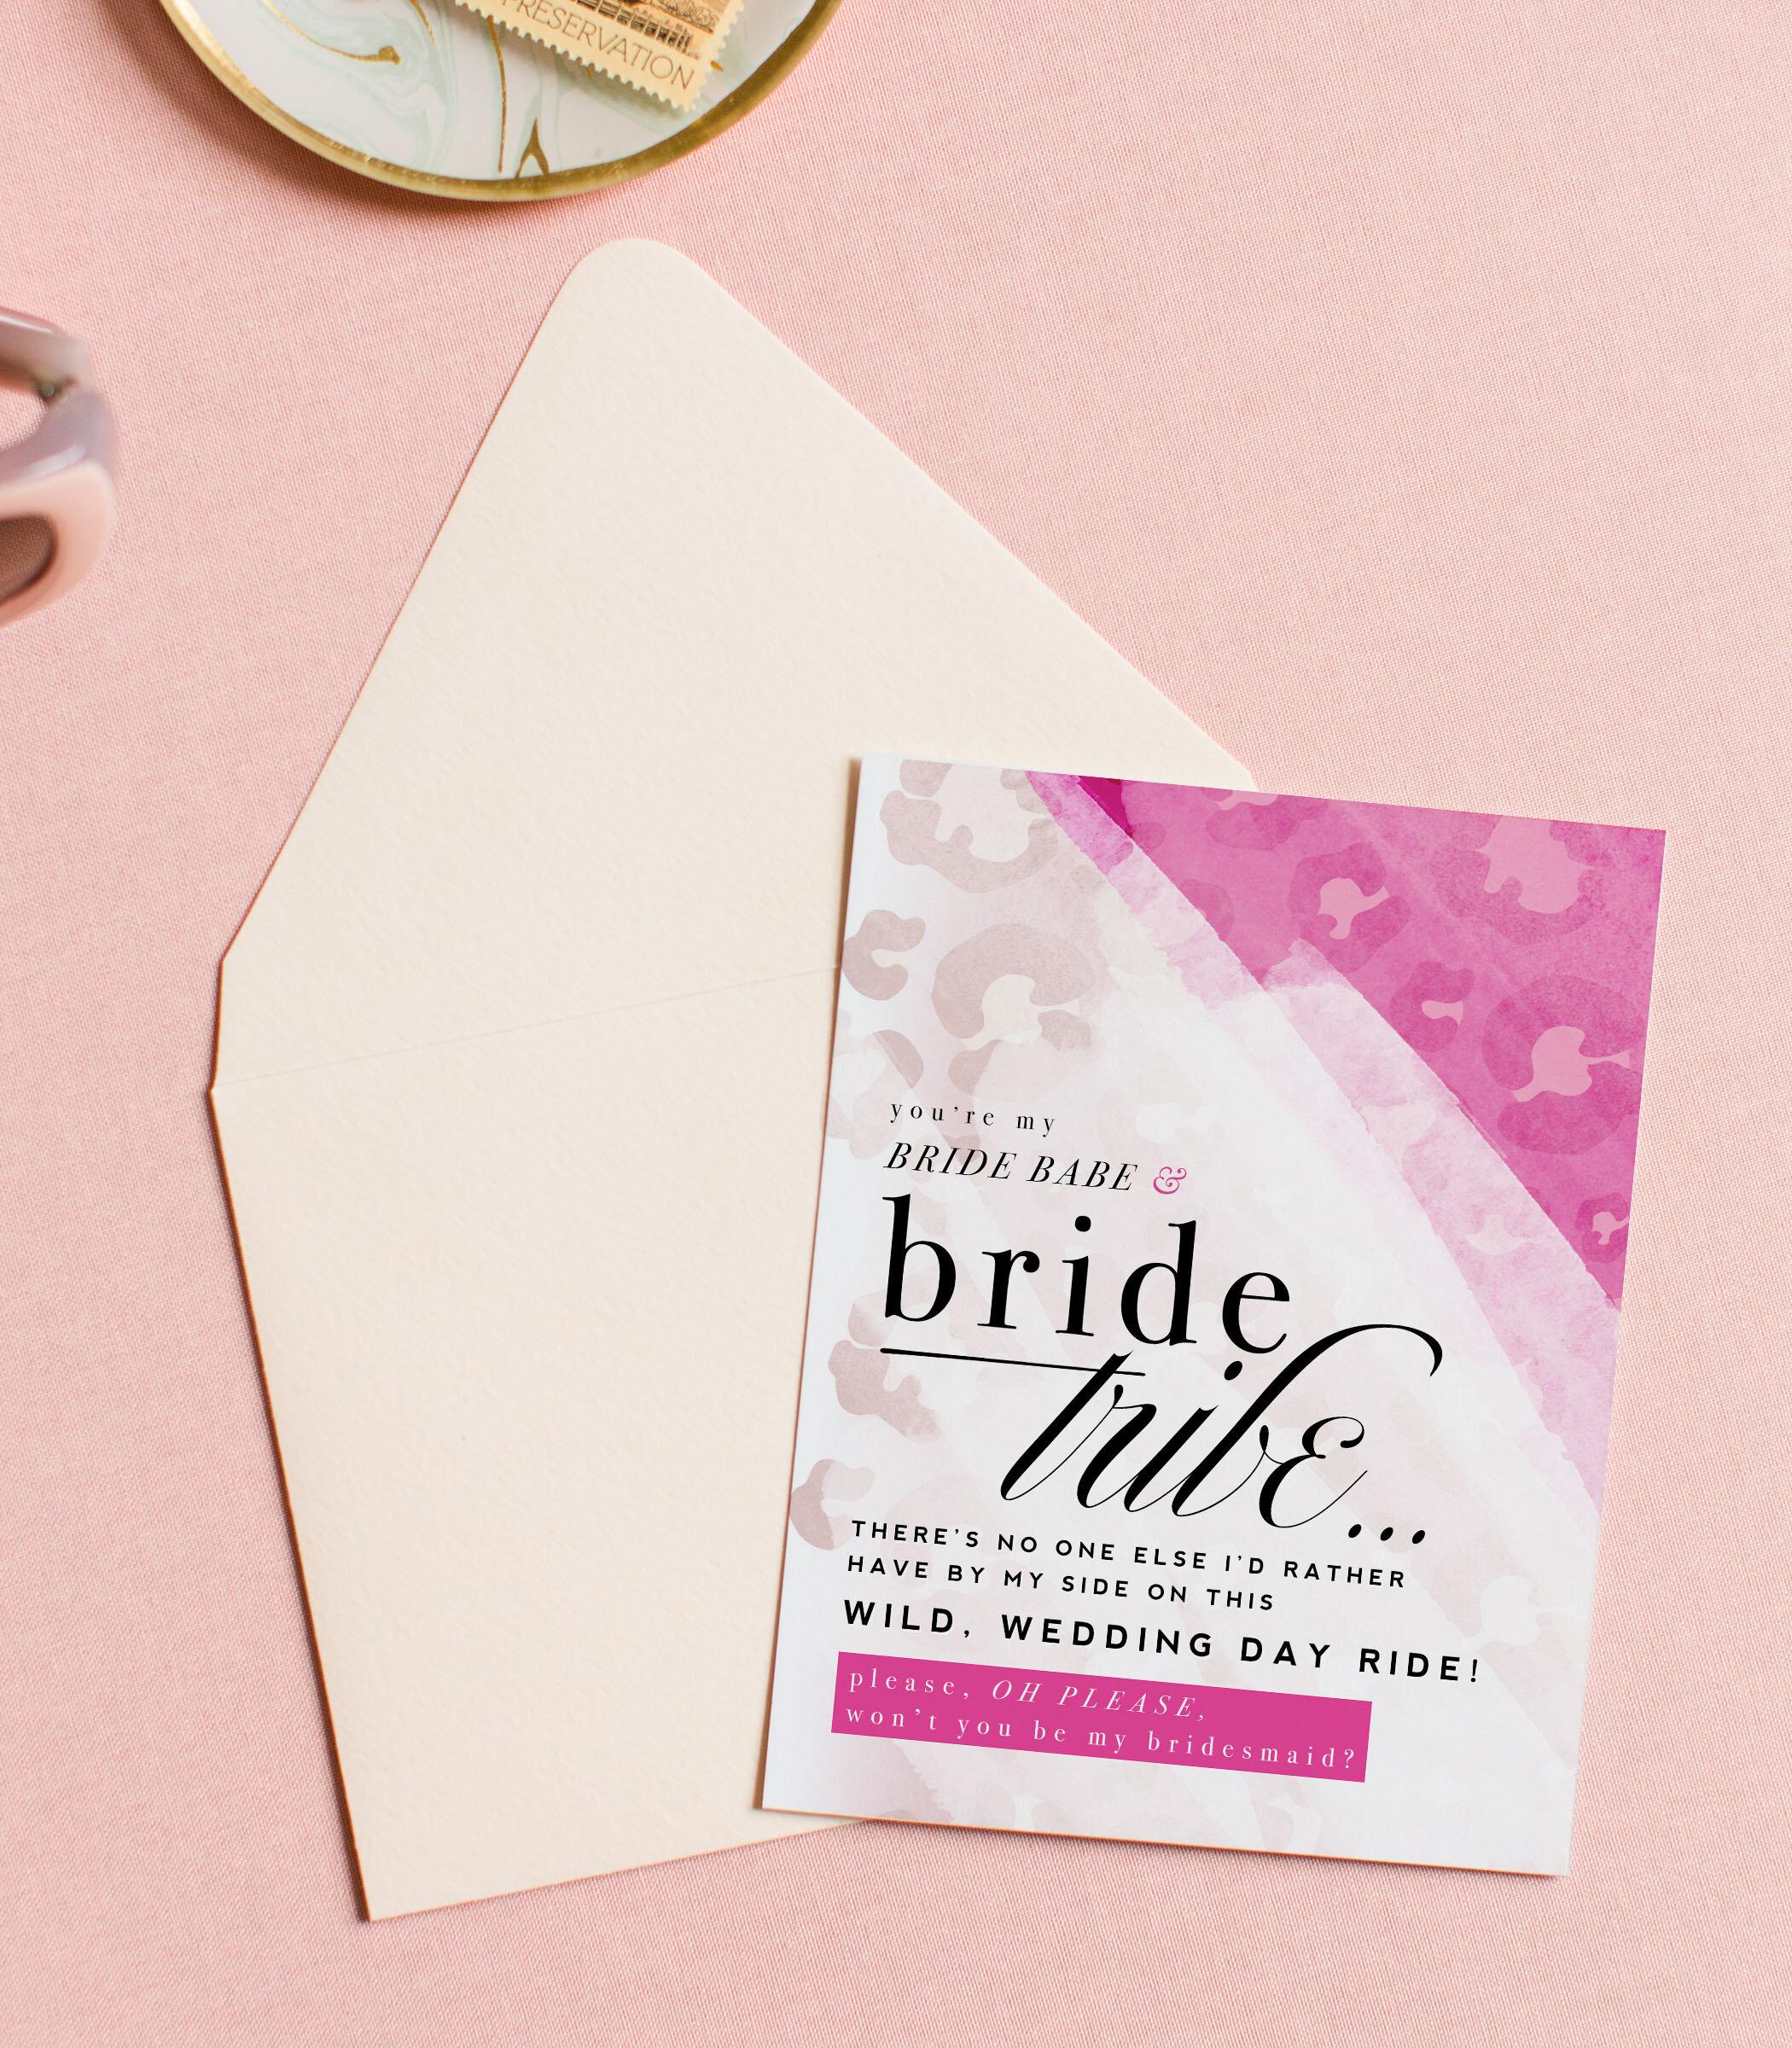 Bridal shower THANK YOU cards wedding BRIGHT PINK 5 bridesmaid